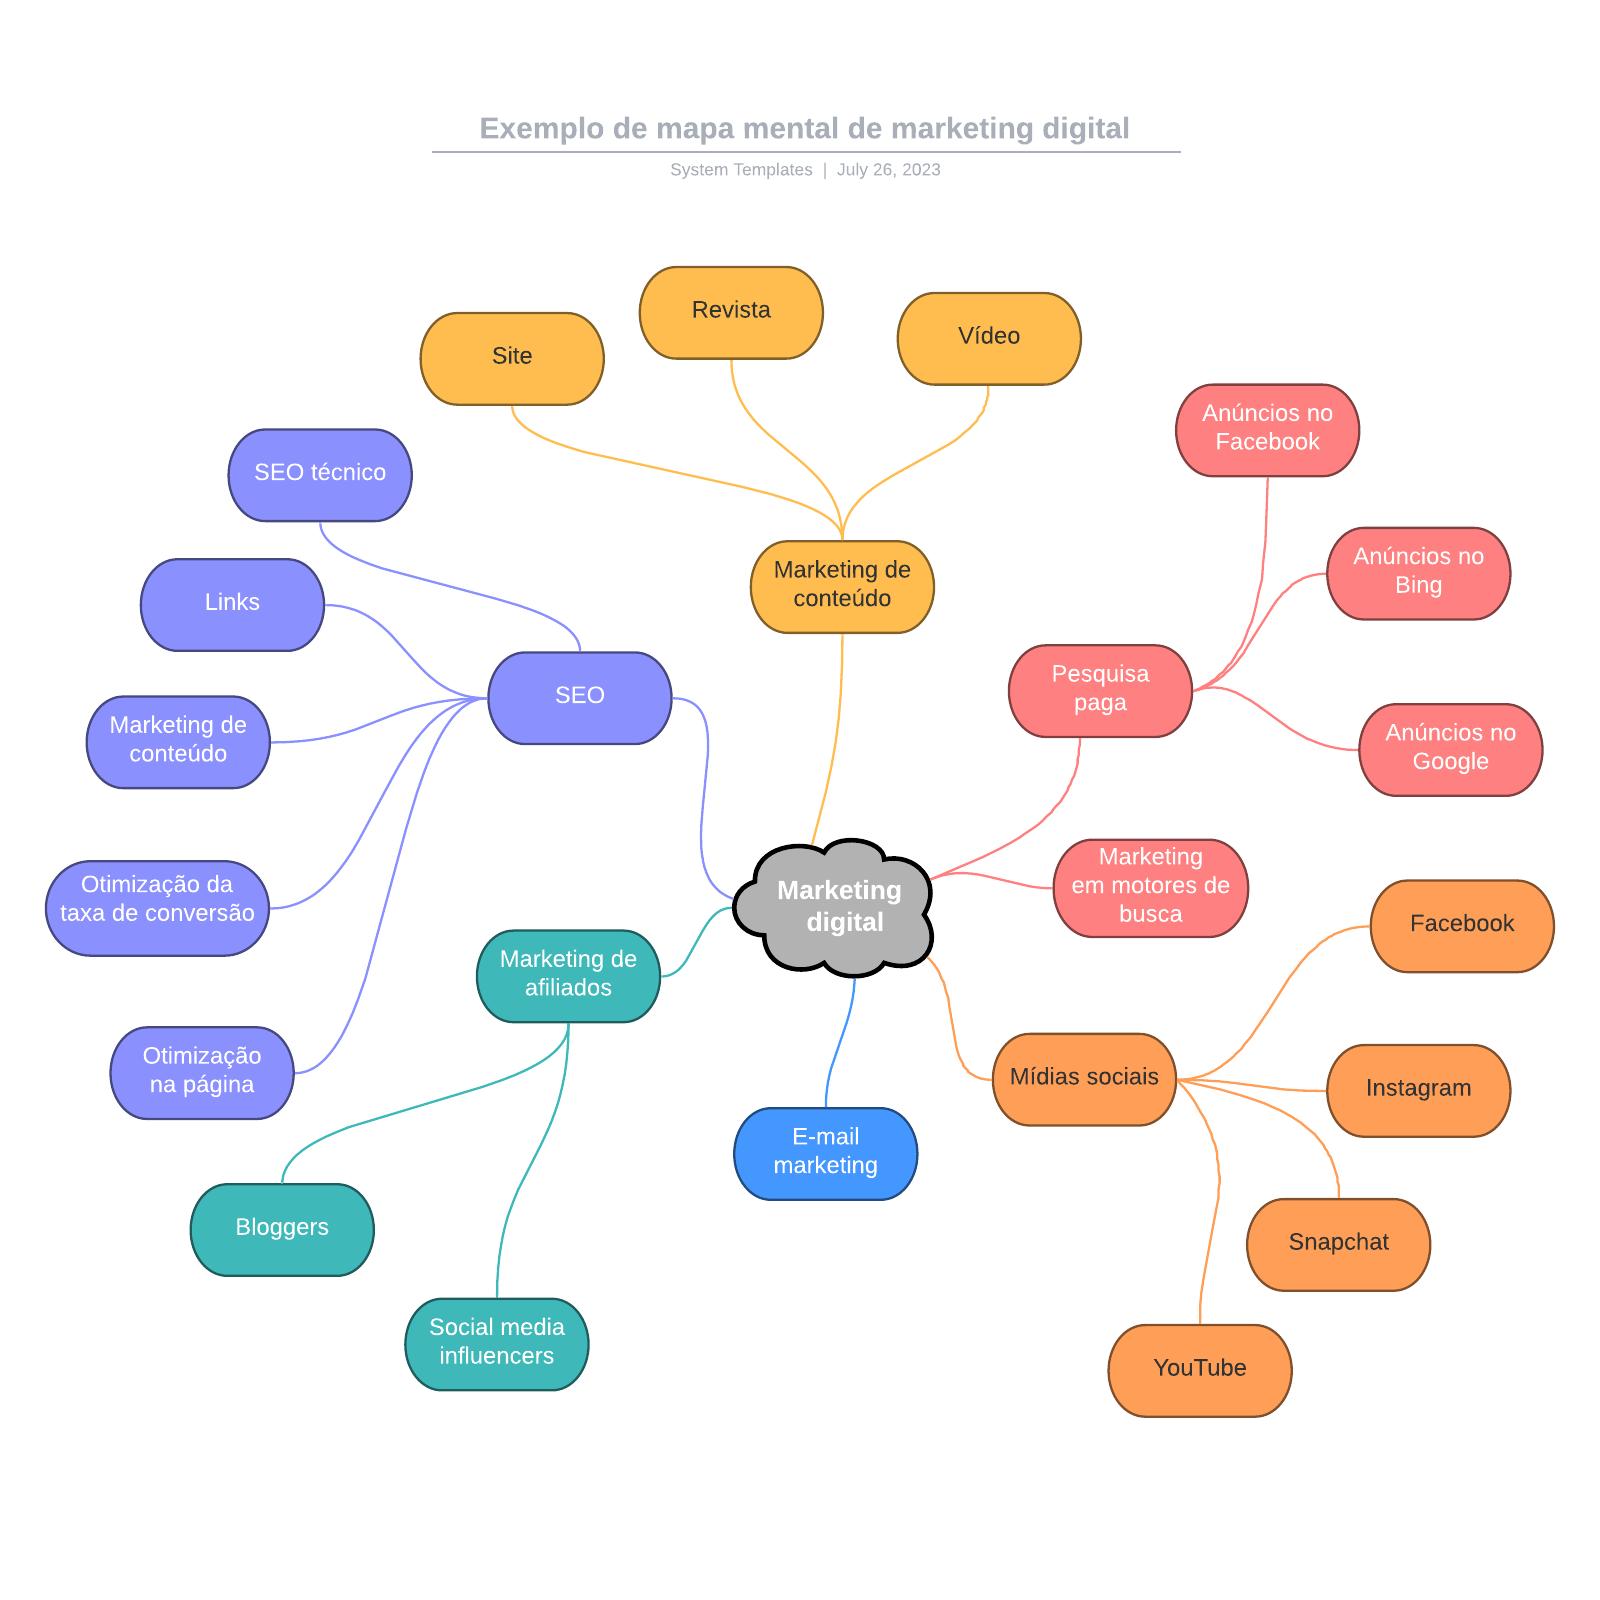 Exemplo de mapa mental de marketing digital